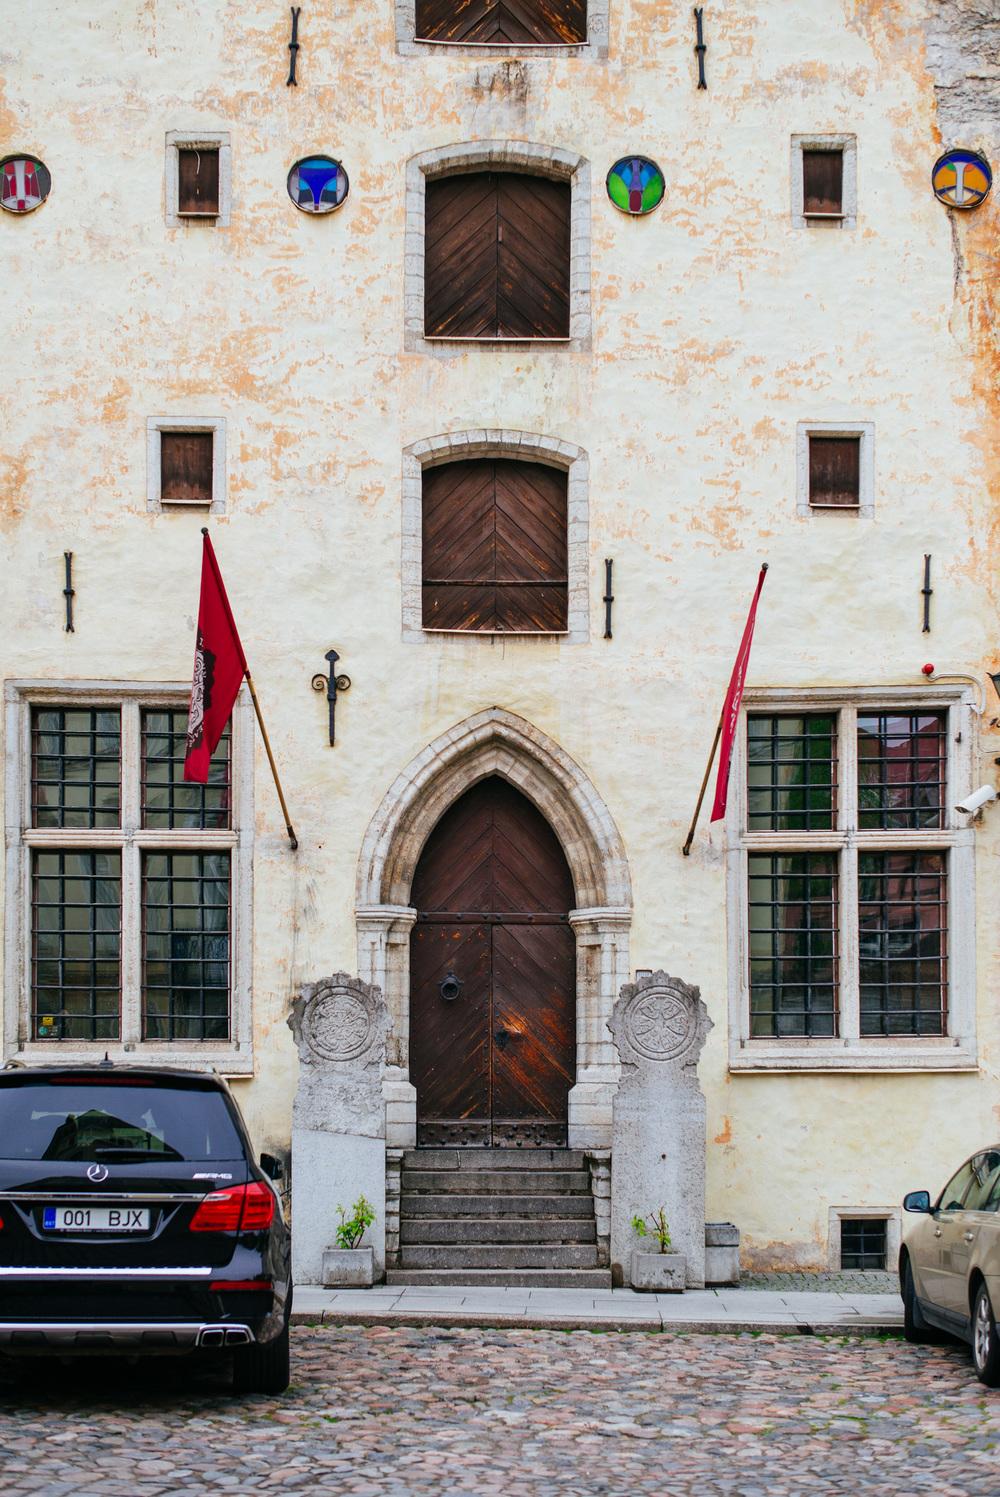 Lai St, Old Town, Tallinn